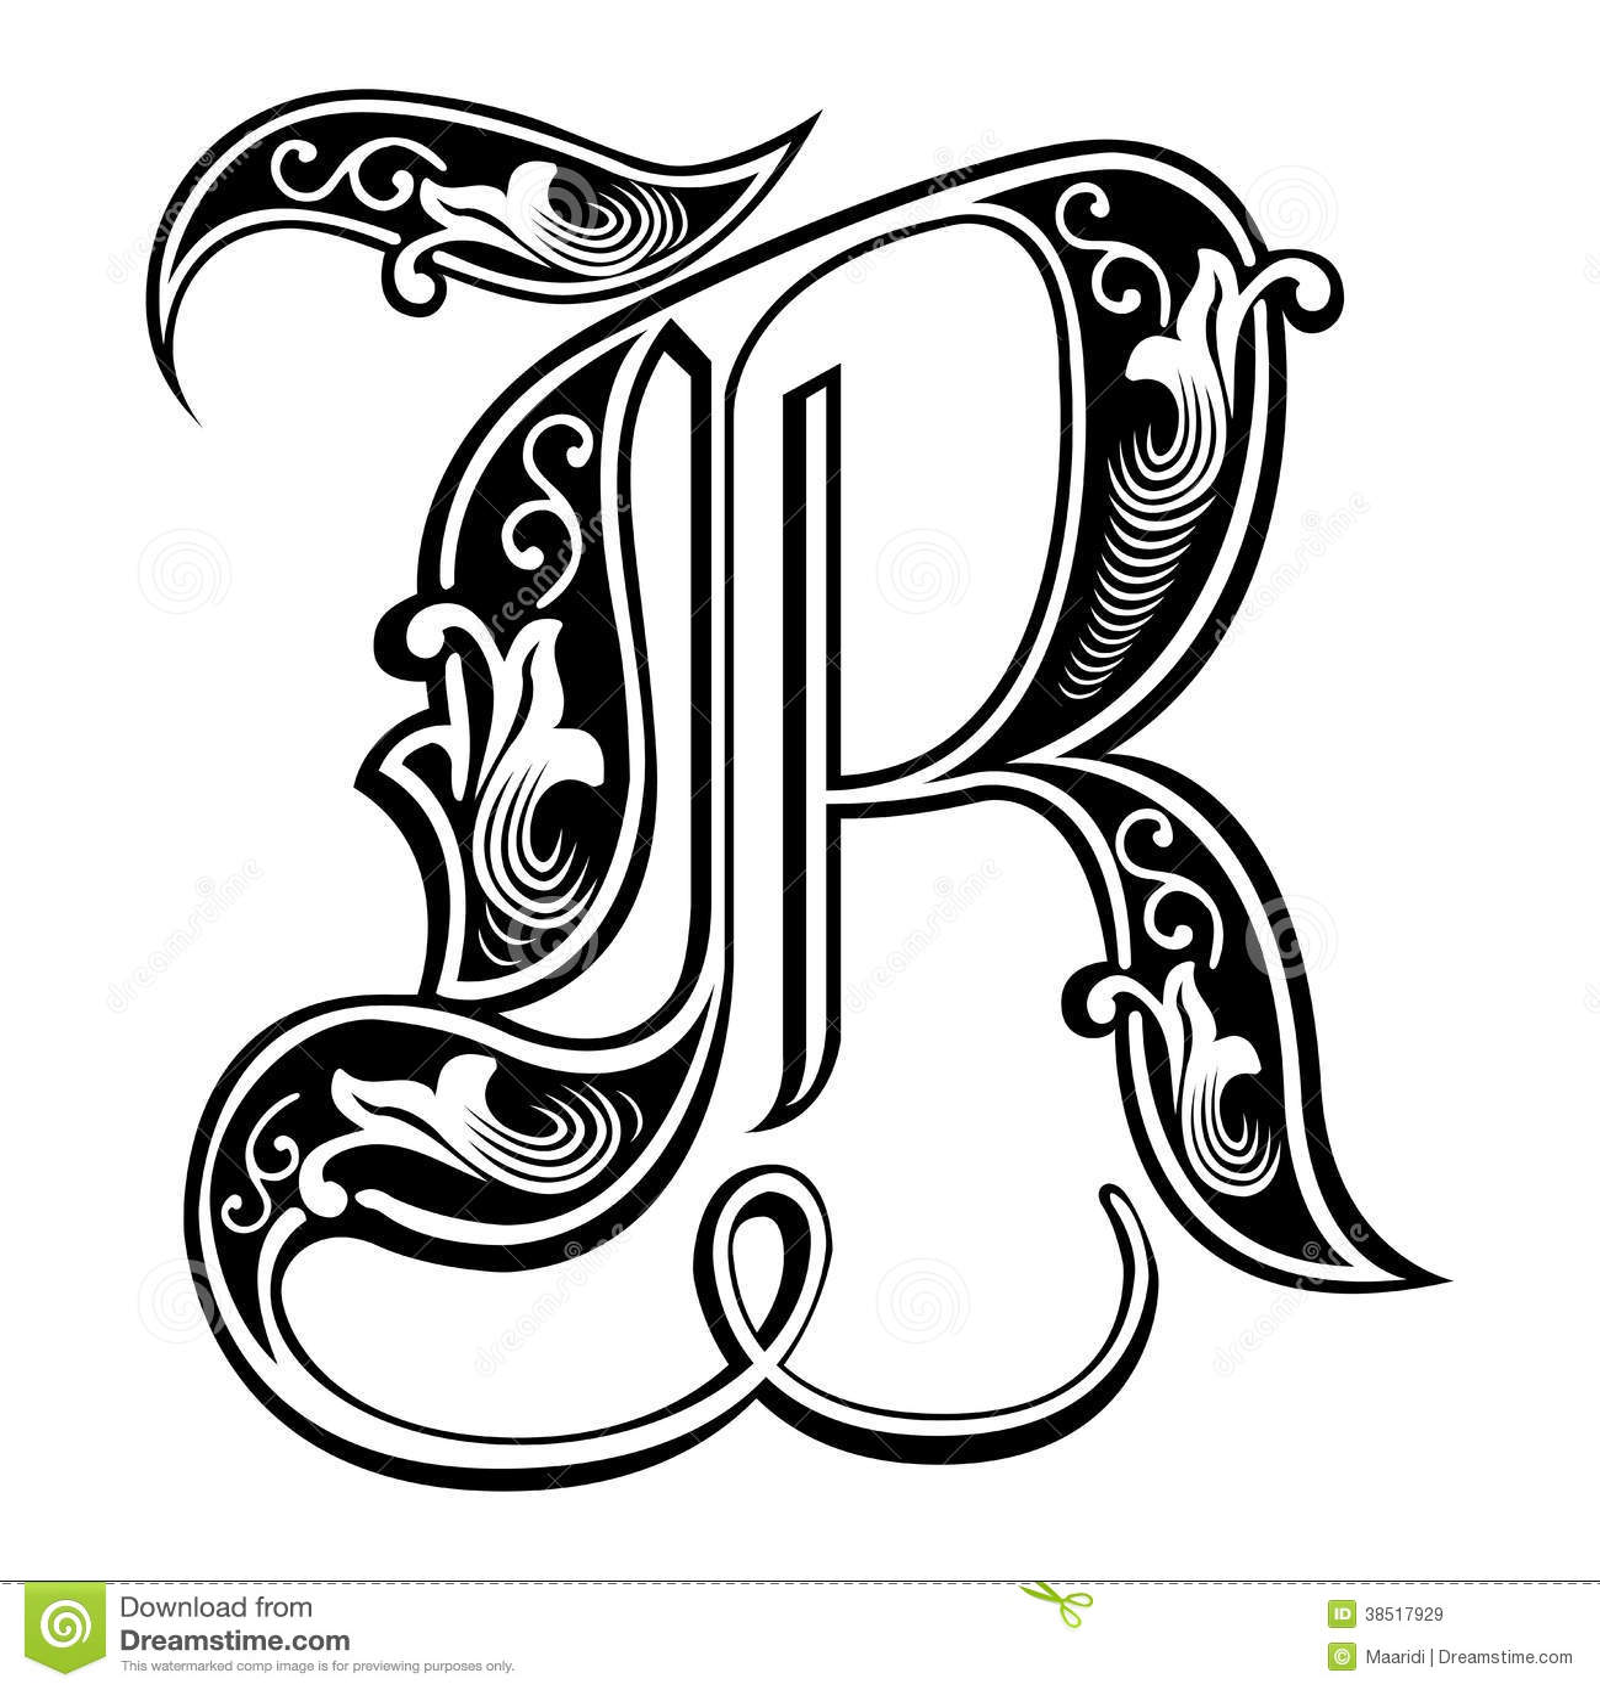 Garnished Gothic Style Font Letter R